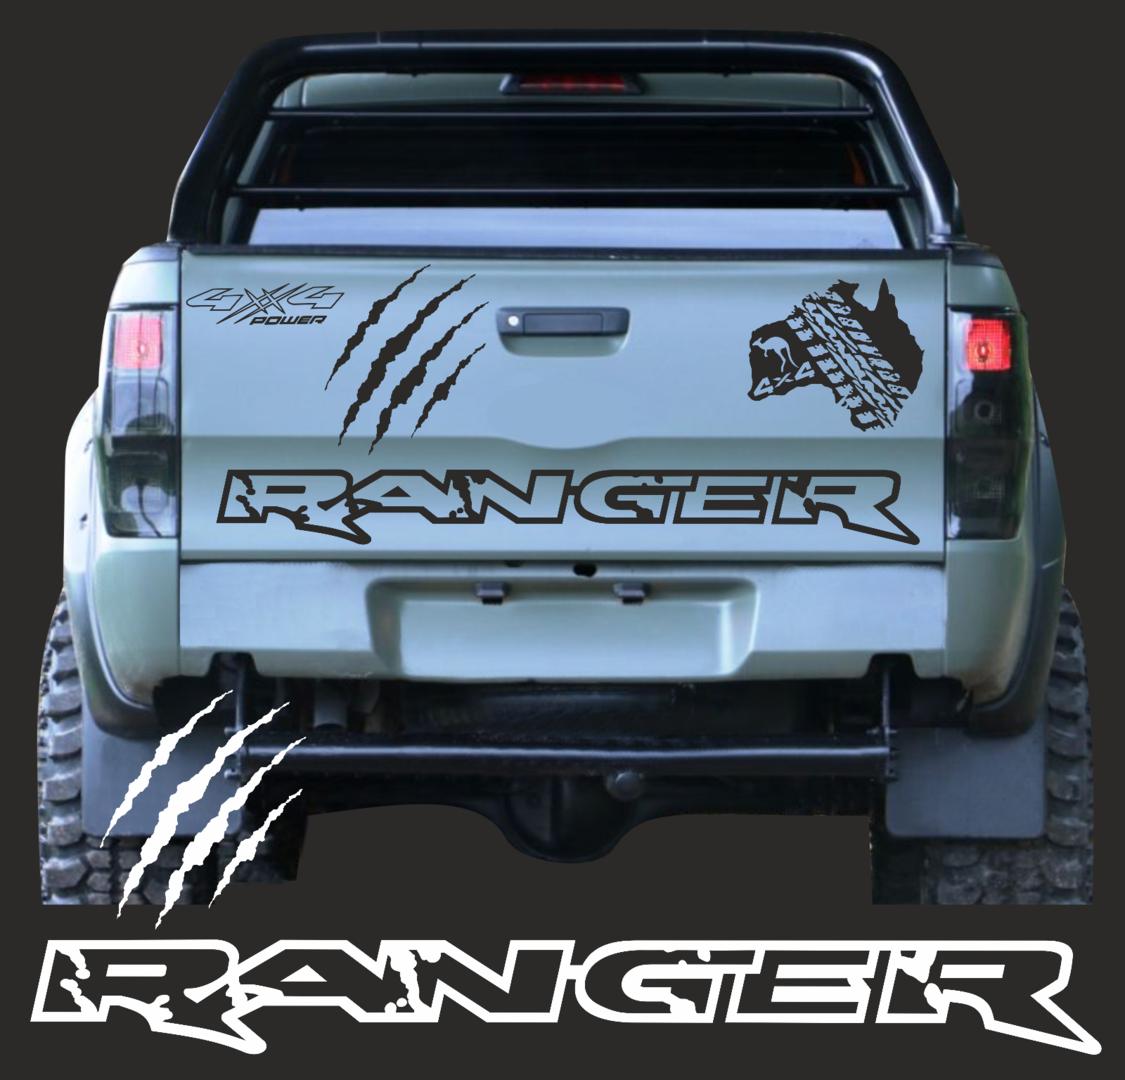 A1076 1x Ranger 4x Kratzer Aufkleber 130cm Rand Pick Up Ranger 4 X 4 Passt Für Ford 2ab